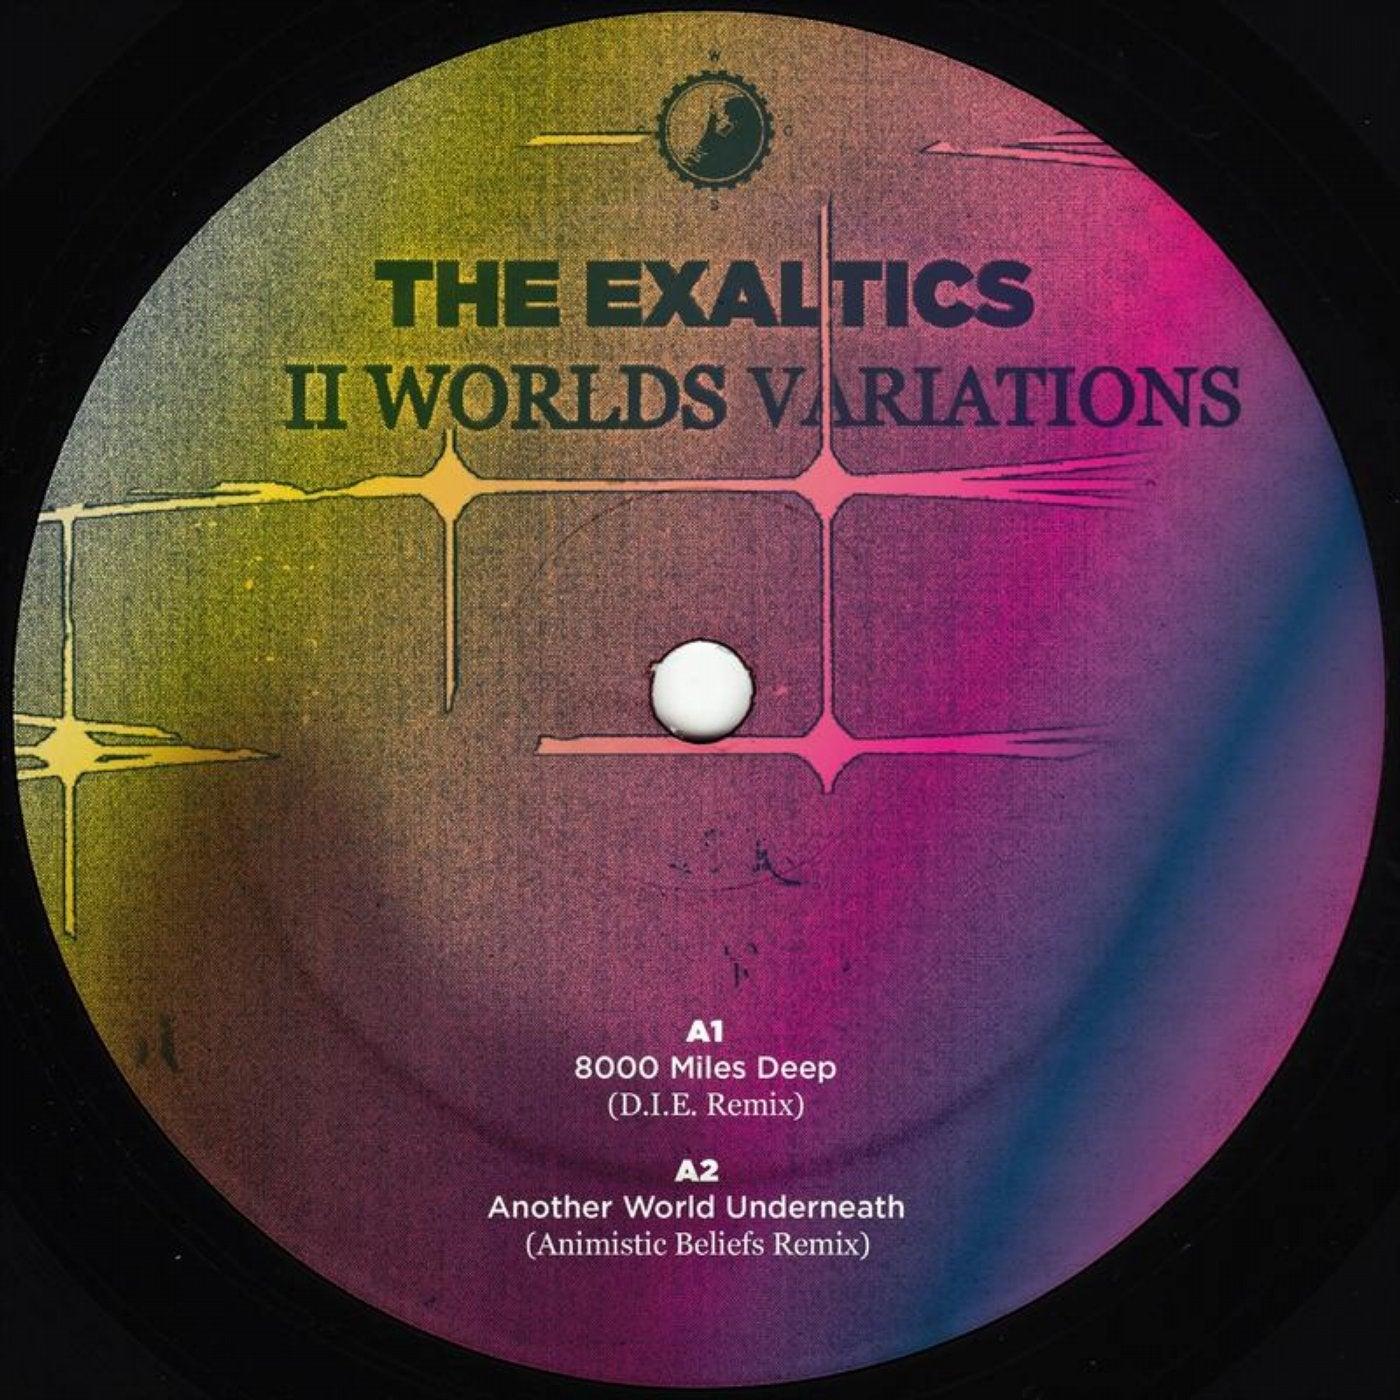 Another World Underneath (Animistic Beliefs Remix)